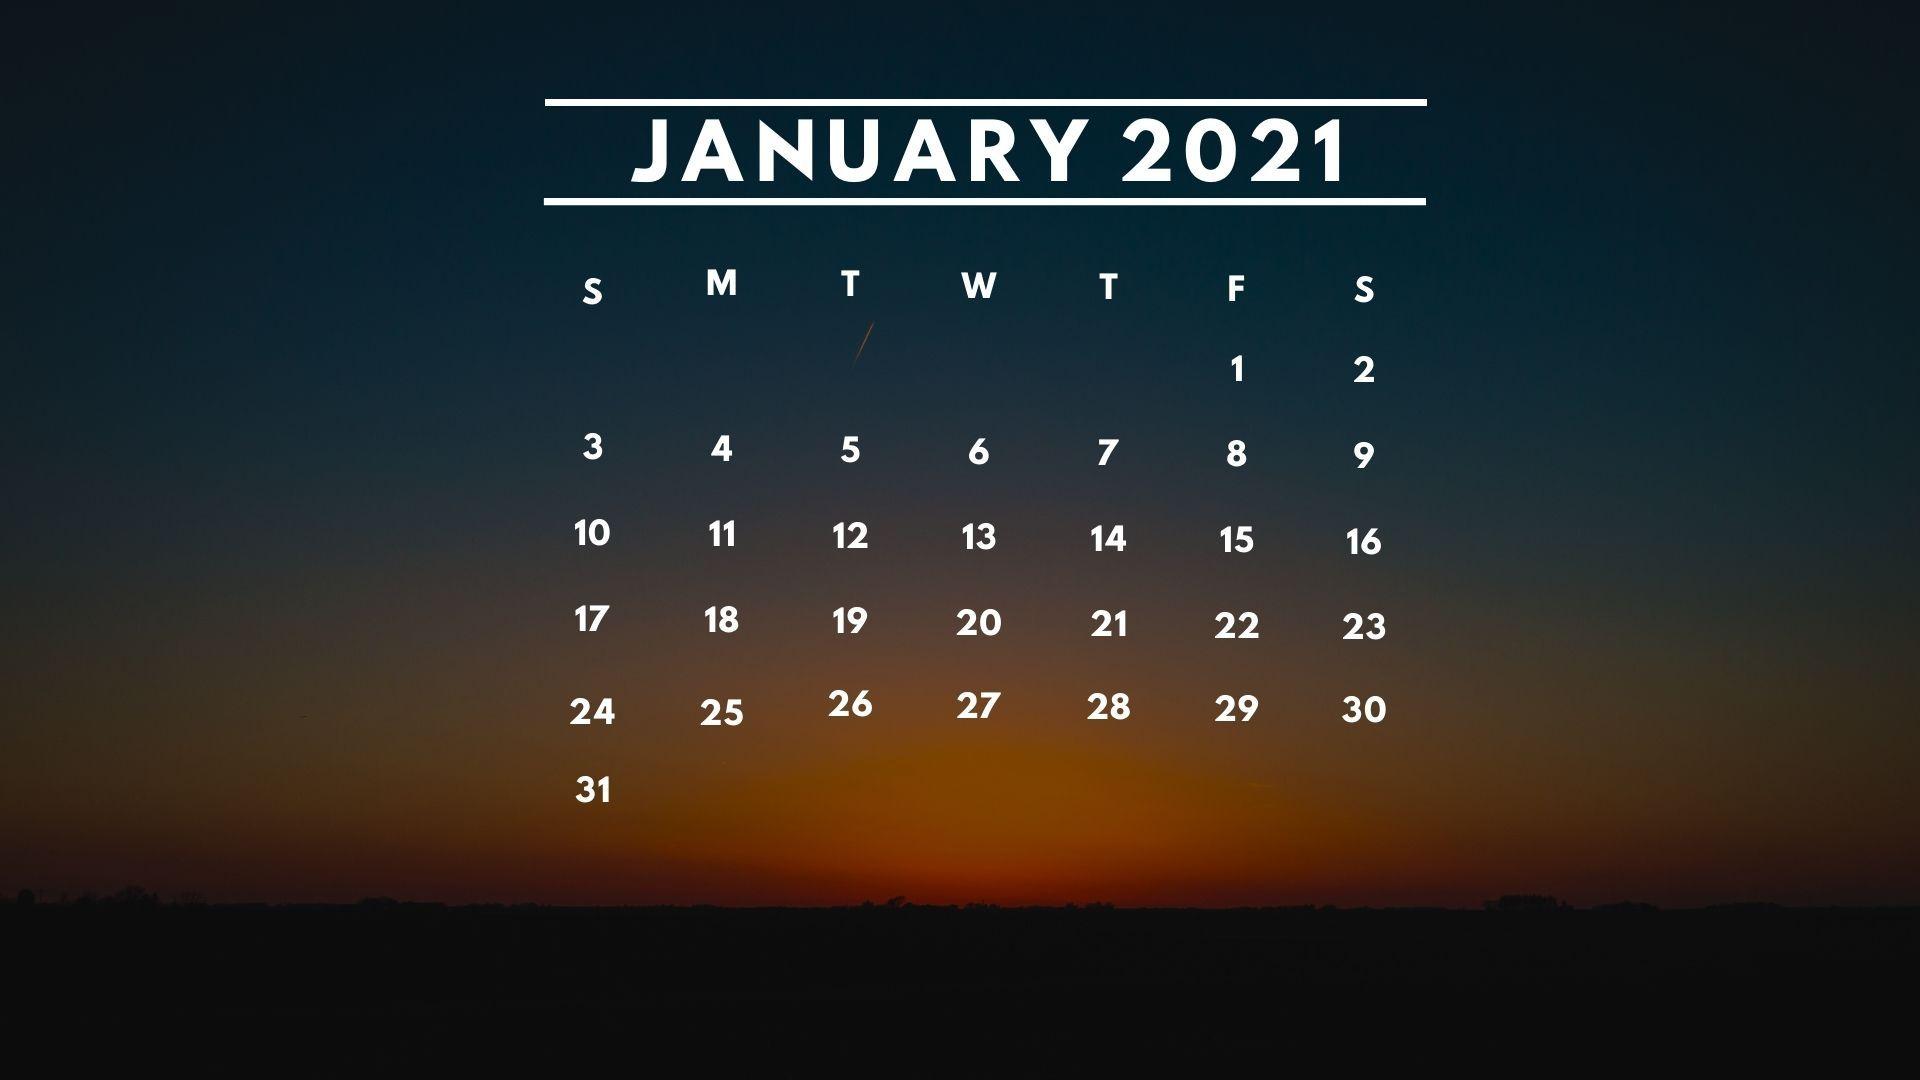 January 2021 Calendar Desktop Background Wallpaper Download 1920x1080